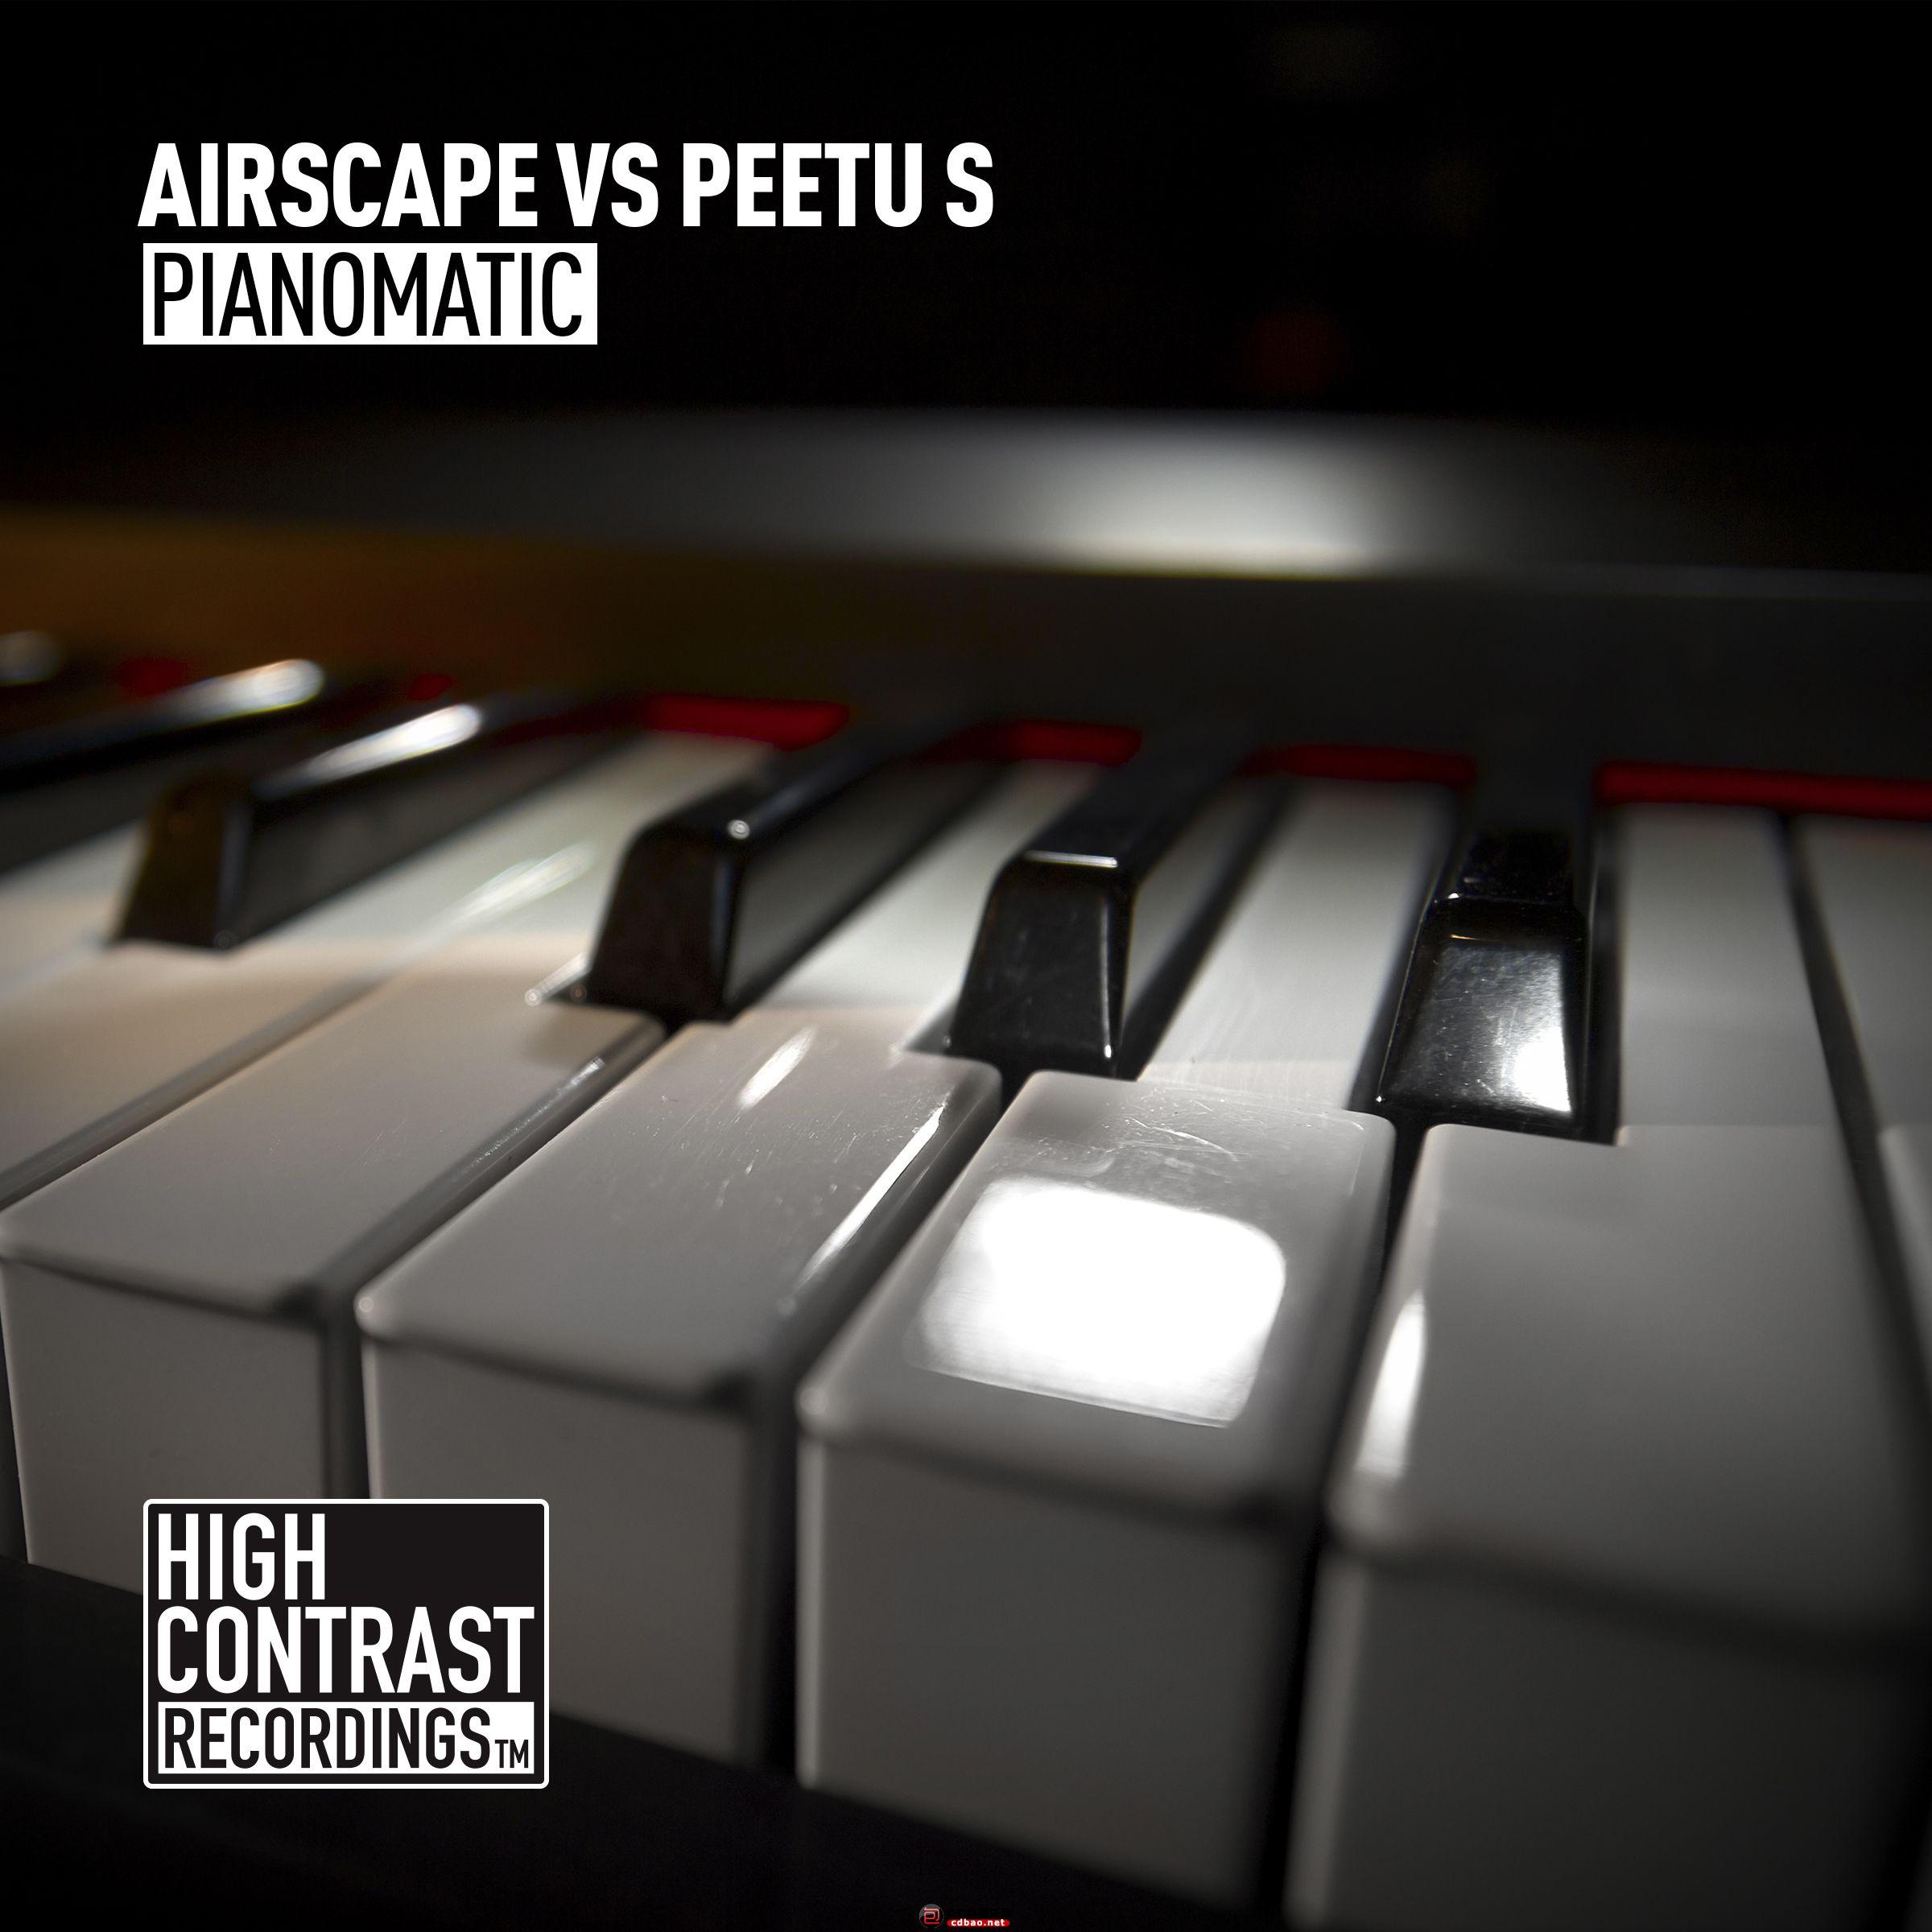 迷幻舞曲:Beatport Trance Pack《75CD》07-07-2015/MP3/BD+115/2.21GB